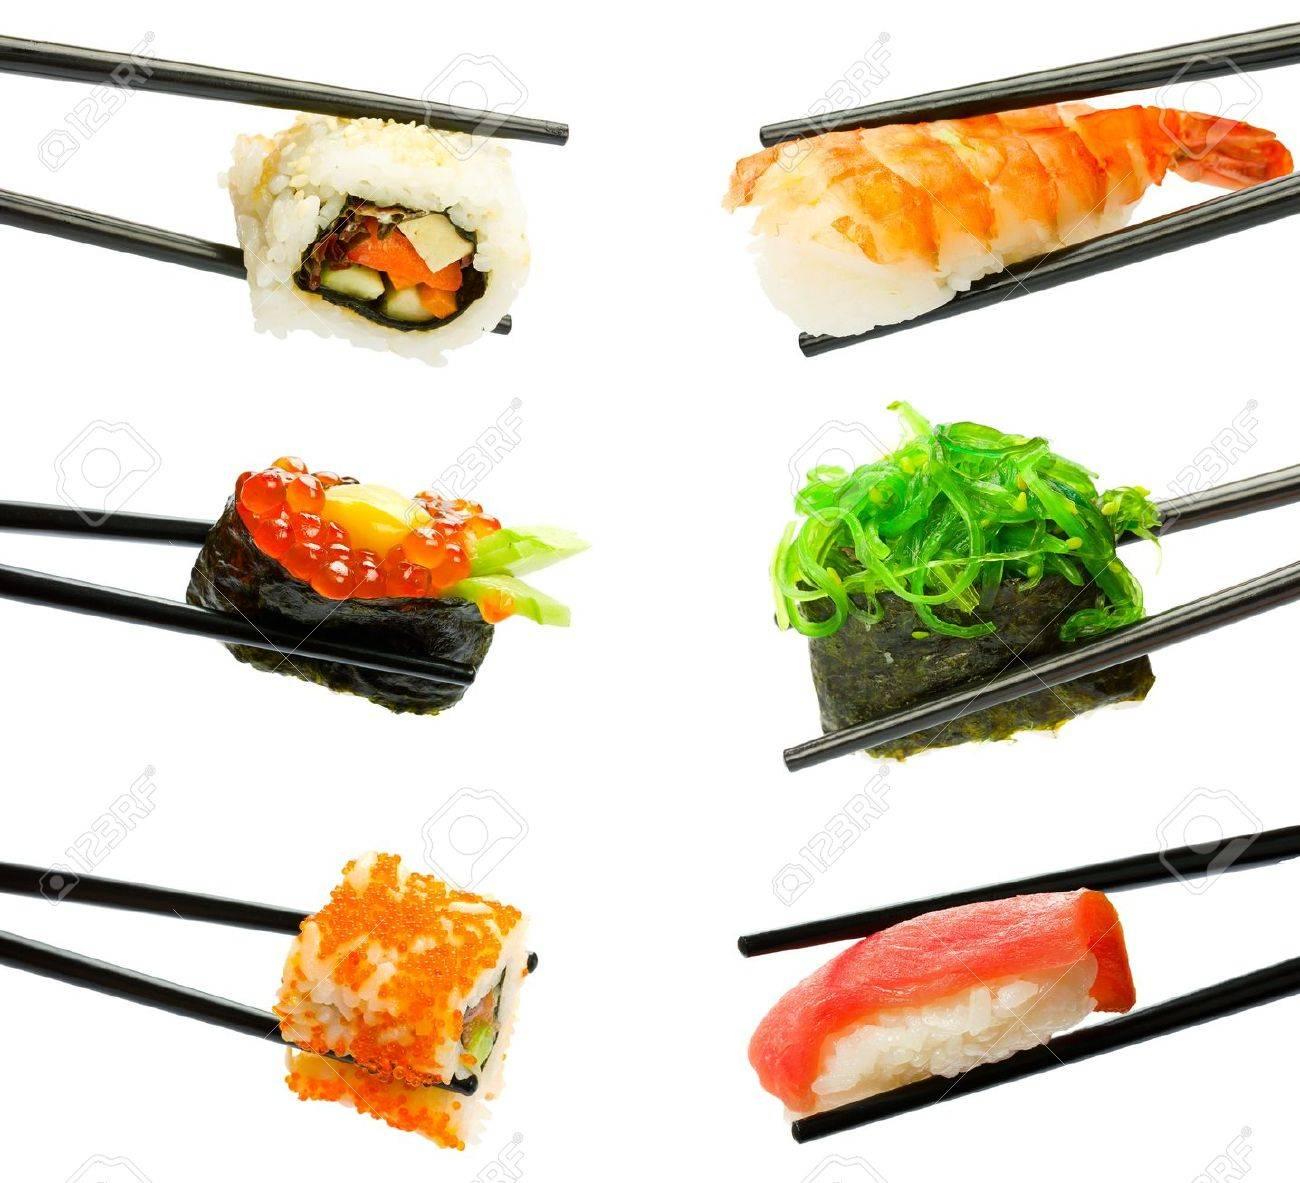 Sushi with chopsticks isolated over white background - 9998850